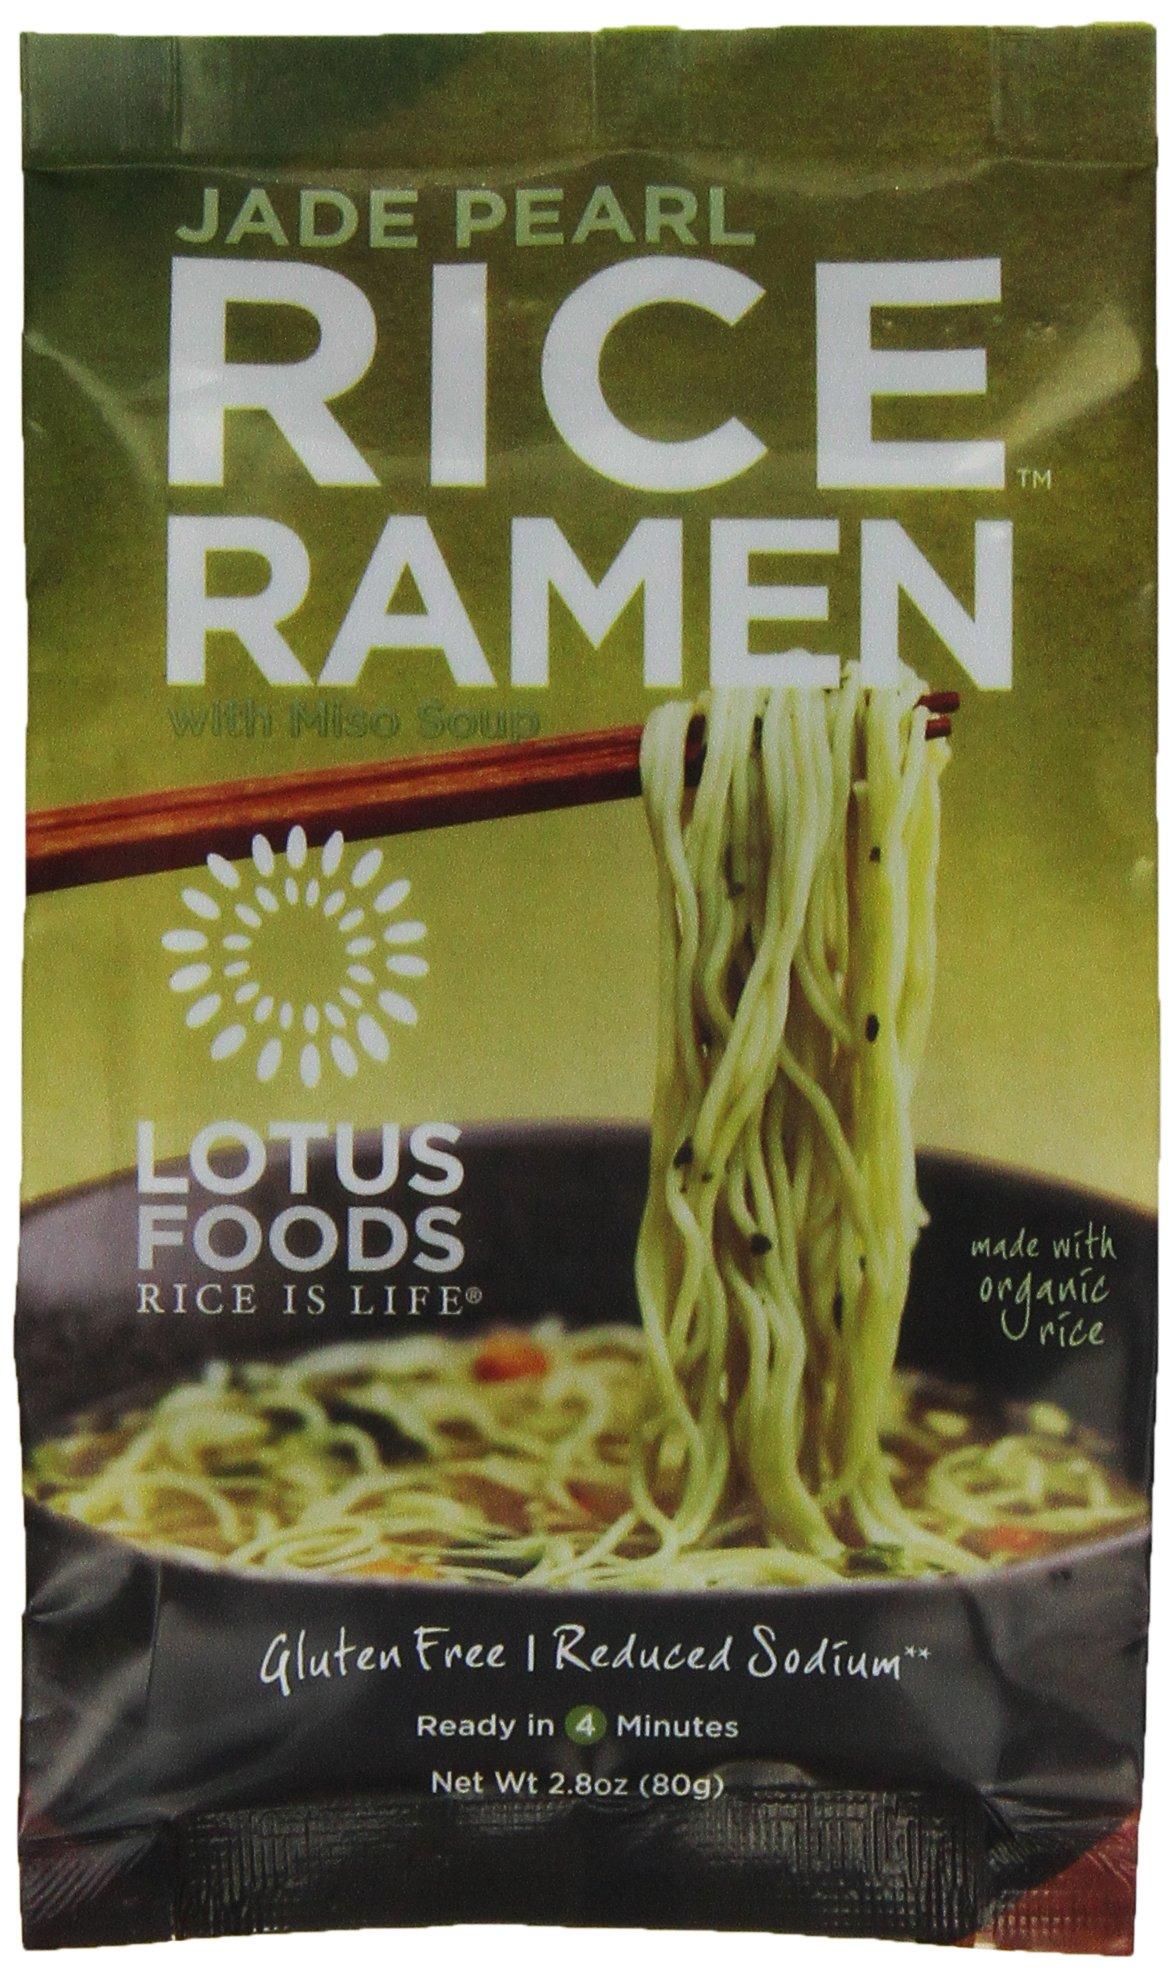 Lotus Foods Gourmet Jade Pearl Rice Ramen and Miso Soup, Lower Sodium, 10 Count by Lotus Foods